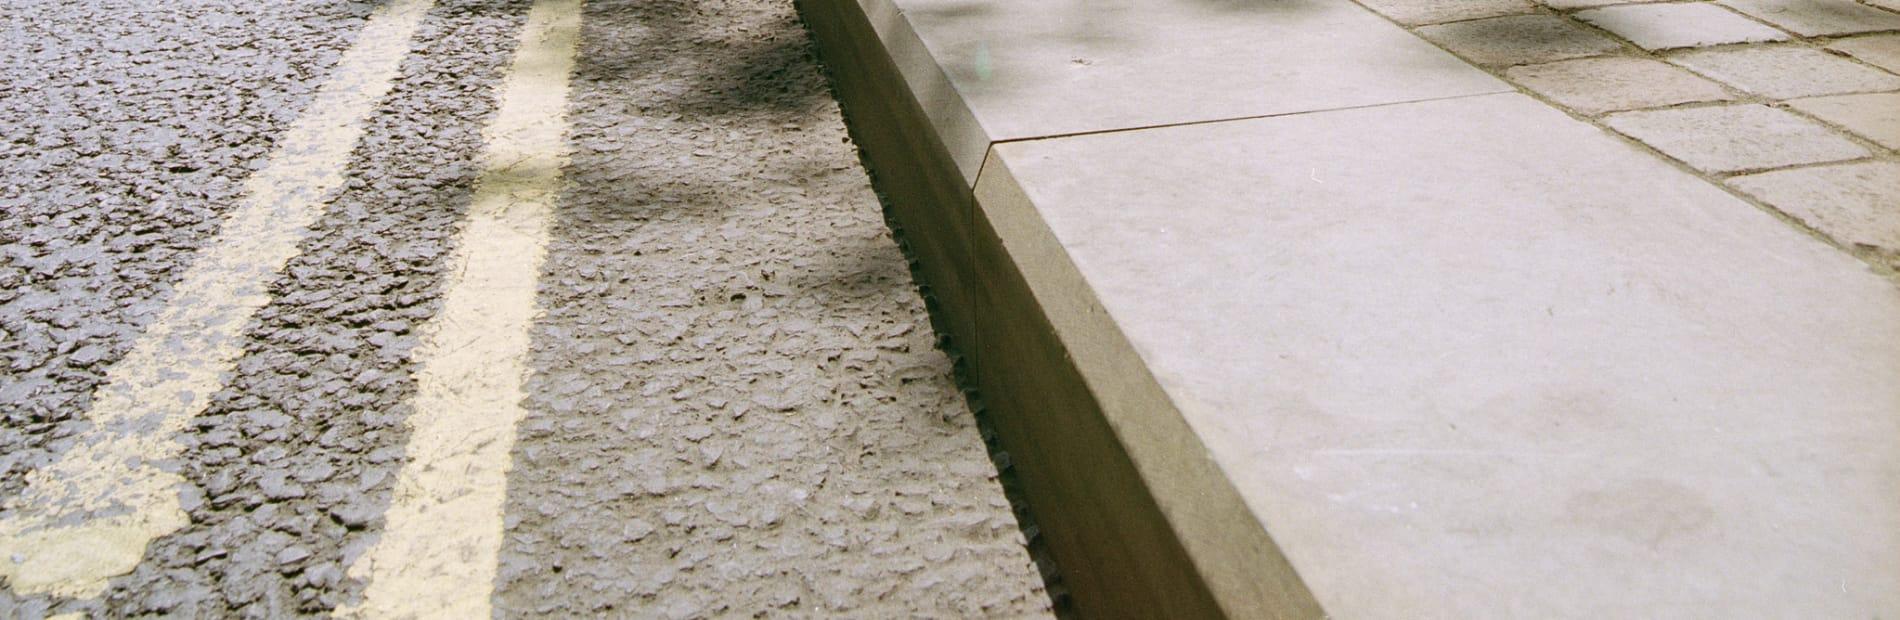 natural stone kerb used roadside